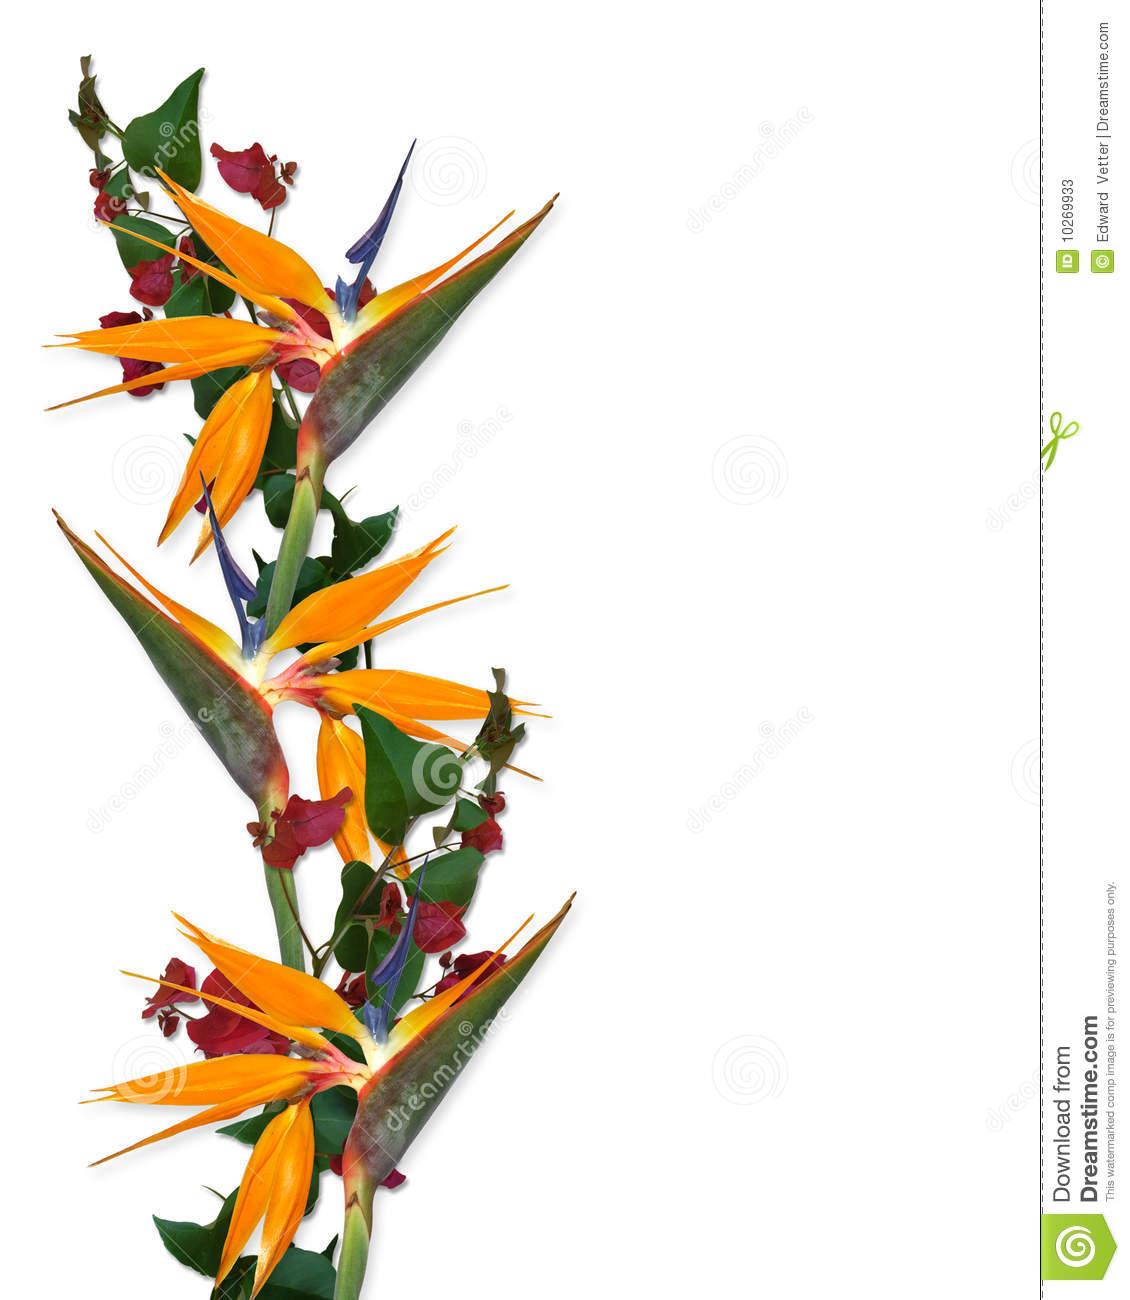 Tropical flowers border panda. Bird clipart borders